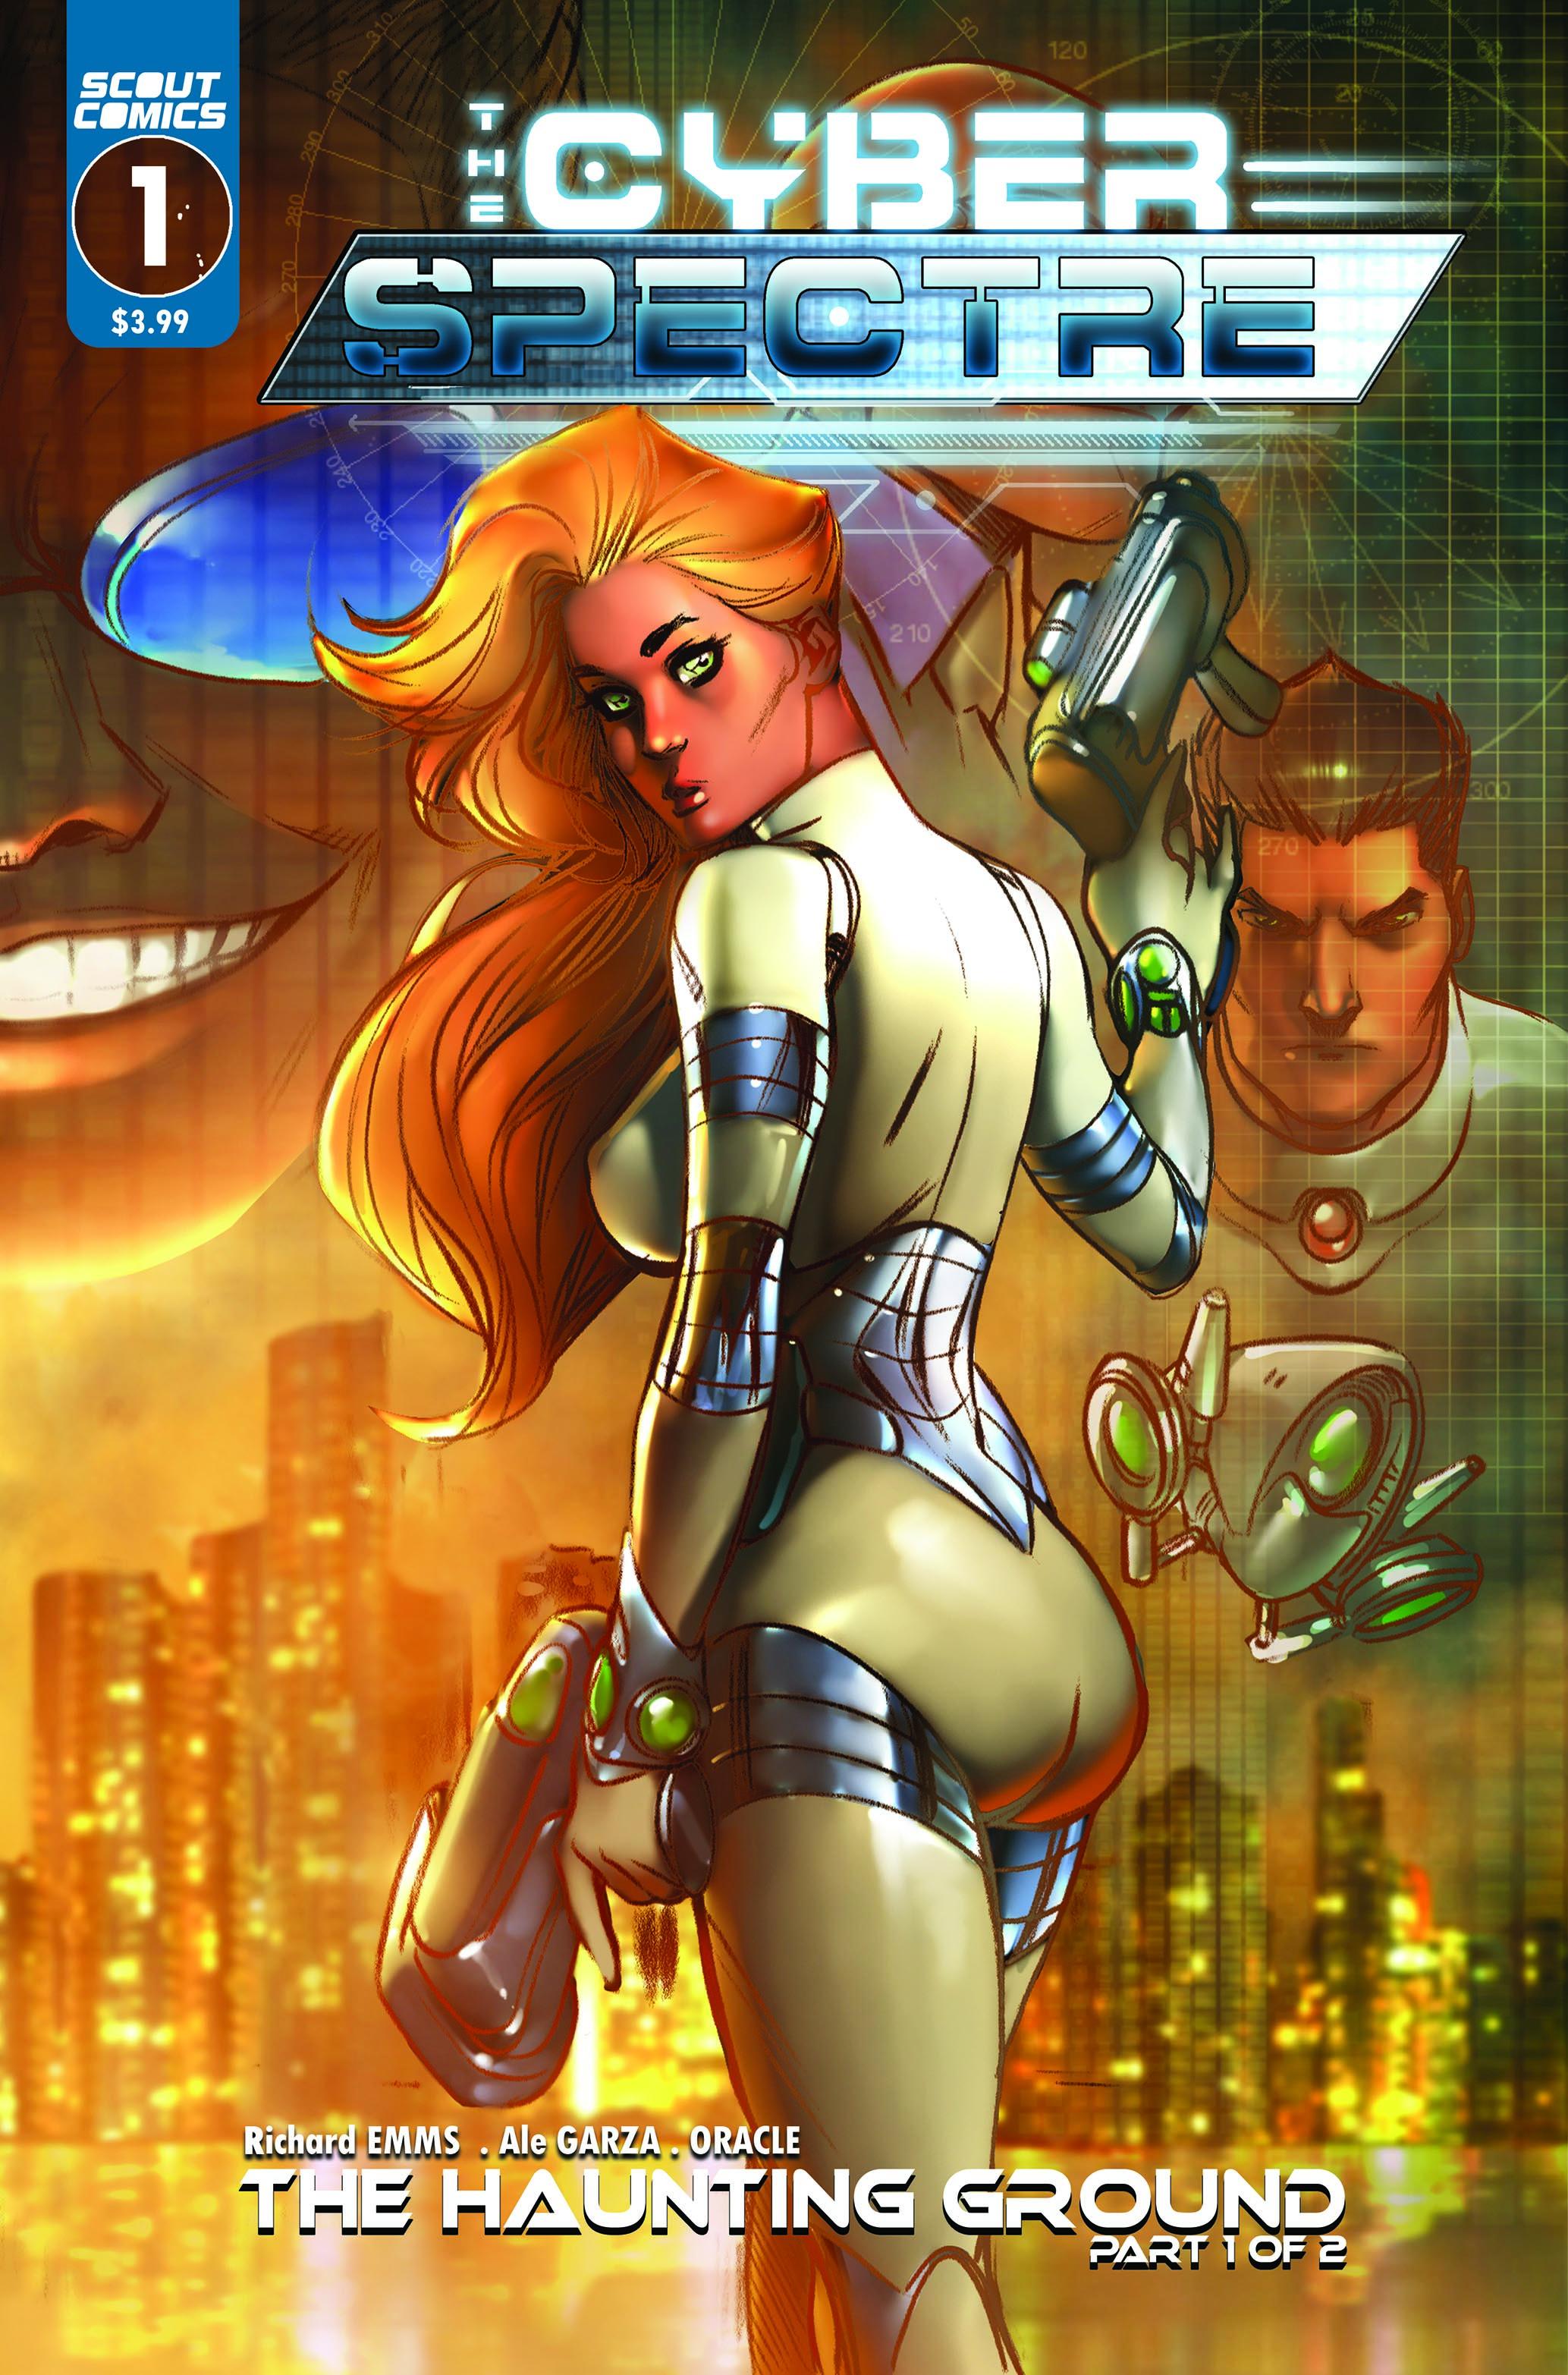 THE CYBER SPECTRE #1 Cover A ALE GARZA COLOR regular cover.jpg